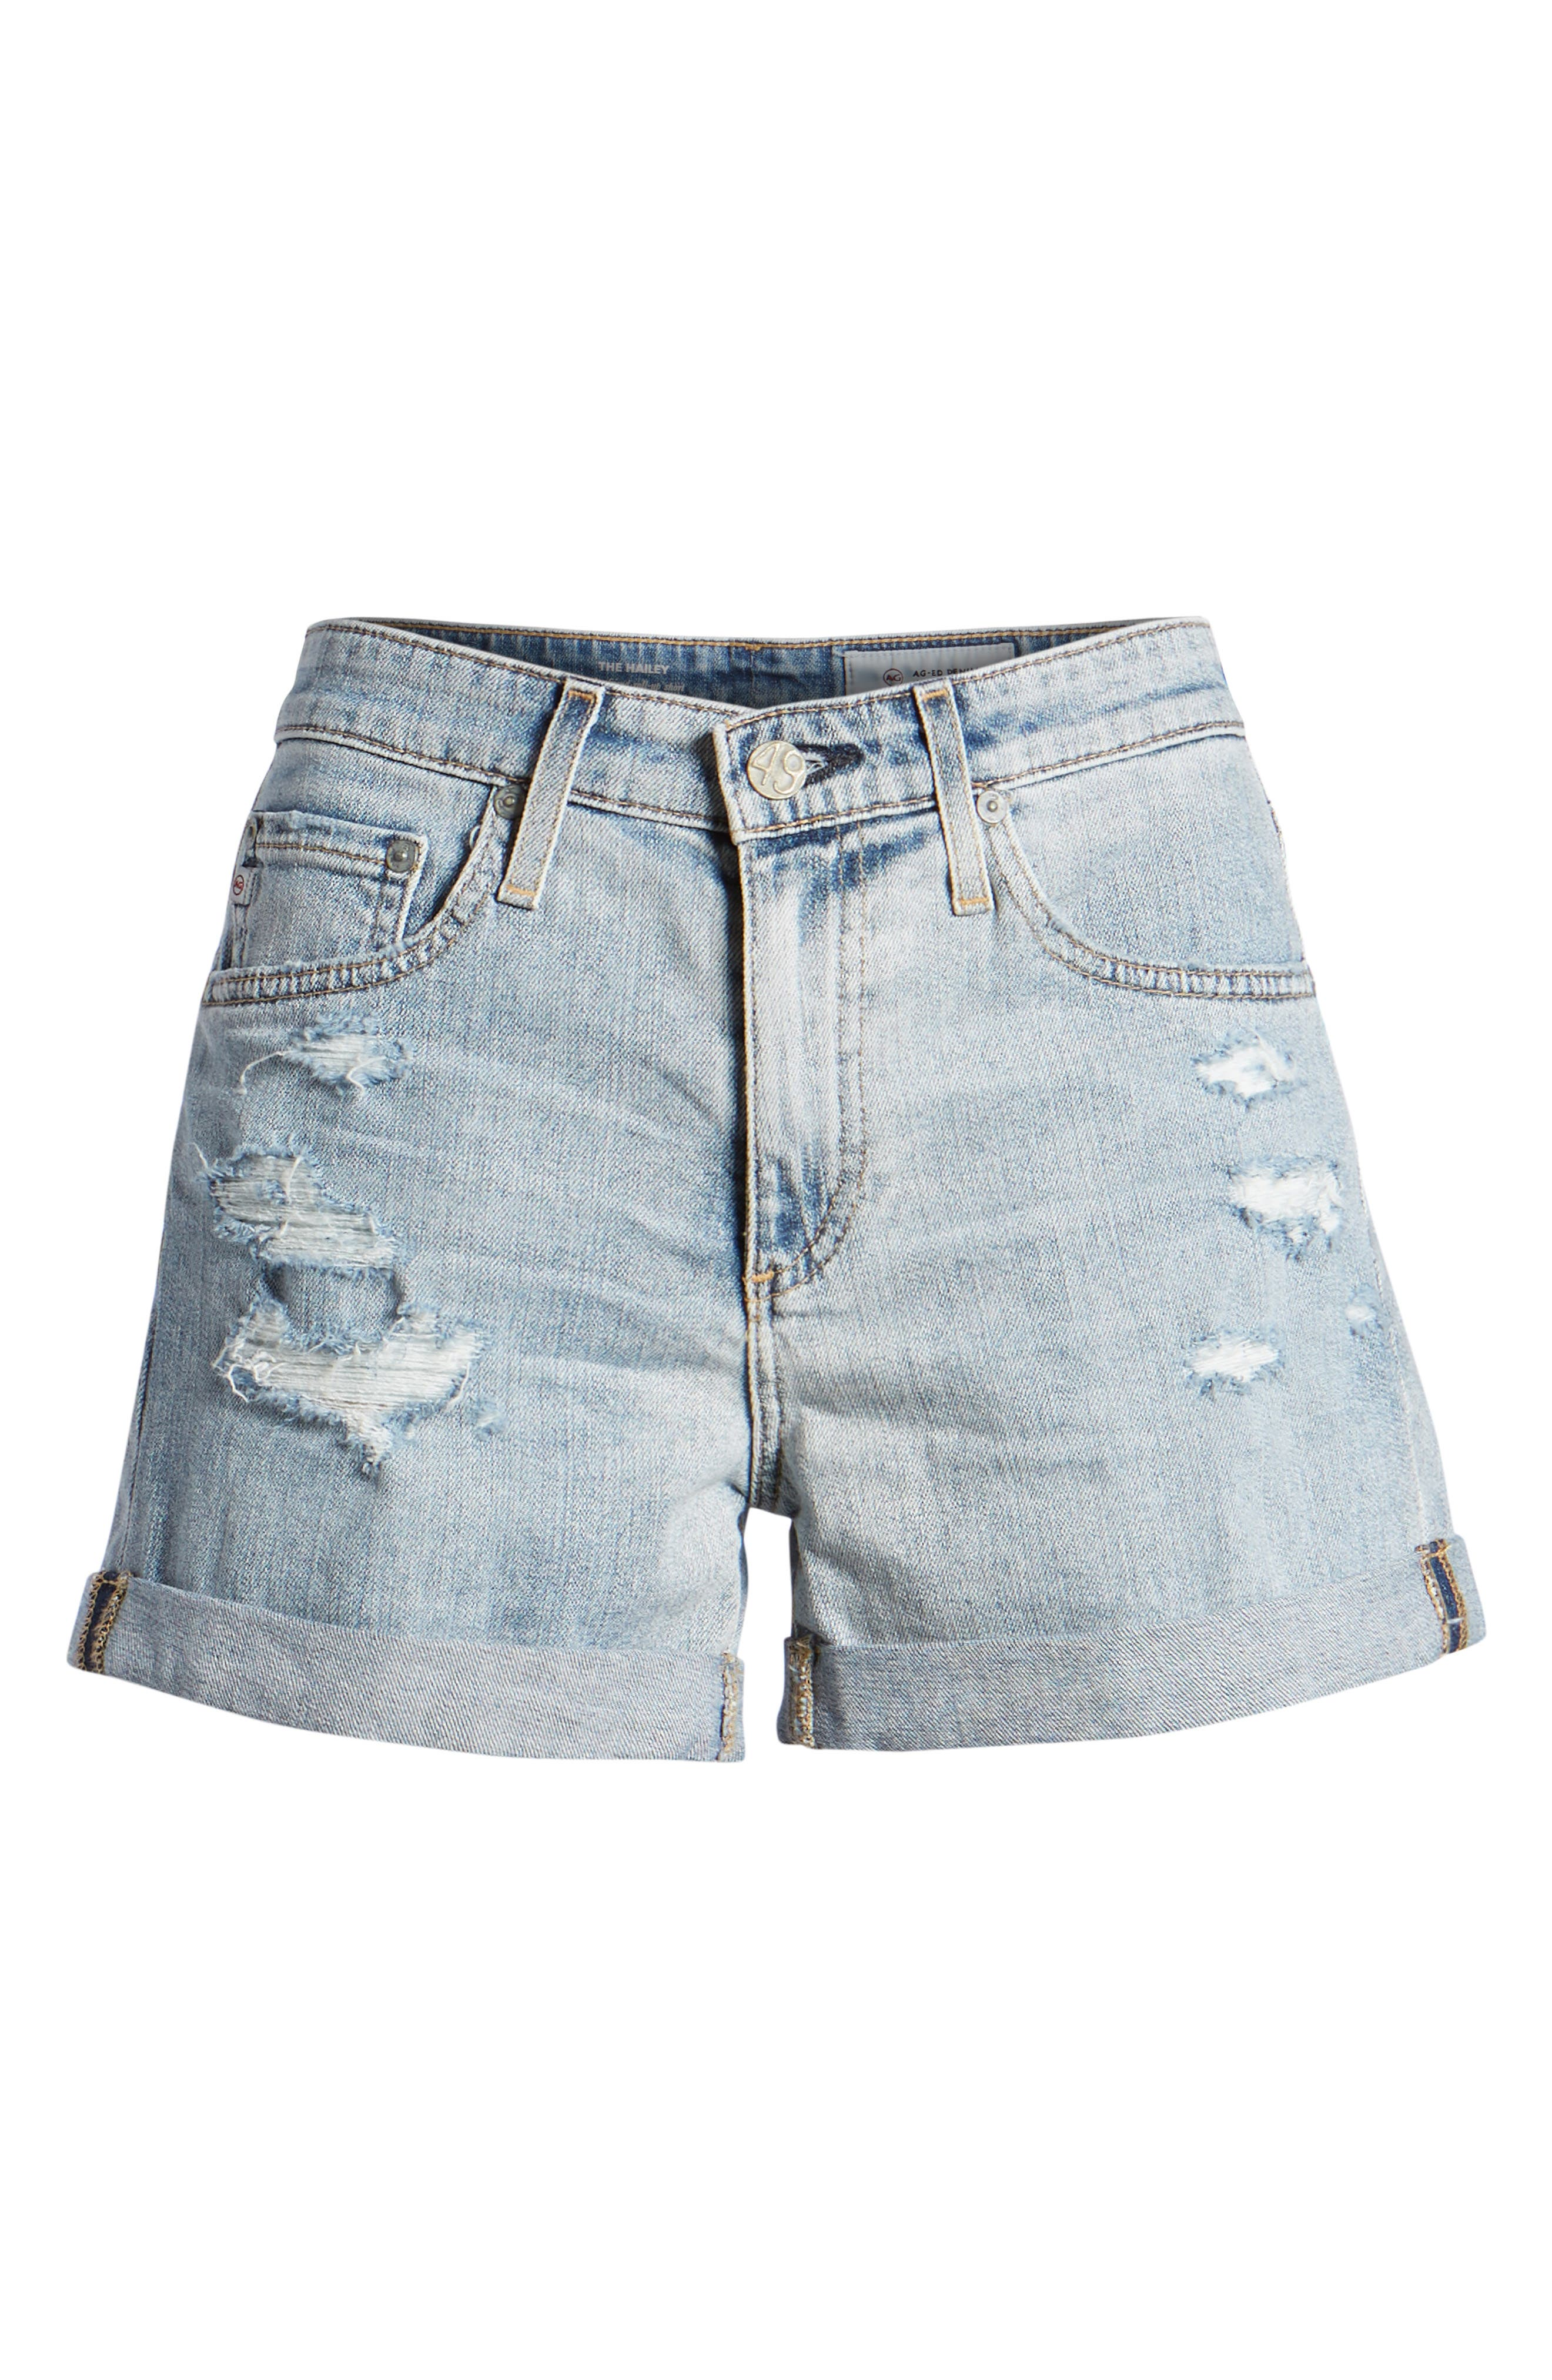 Hailey High Waist Cuff Denim Shorts,                             Alternate thumbnail 7, color,                             21 YRS-REFLECTION DESTRUCTED